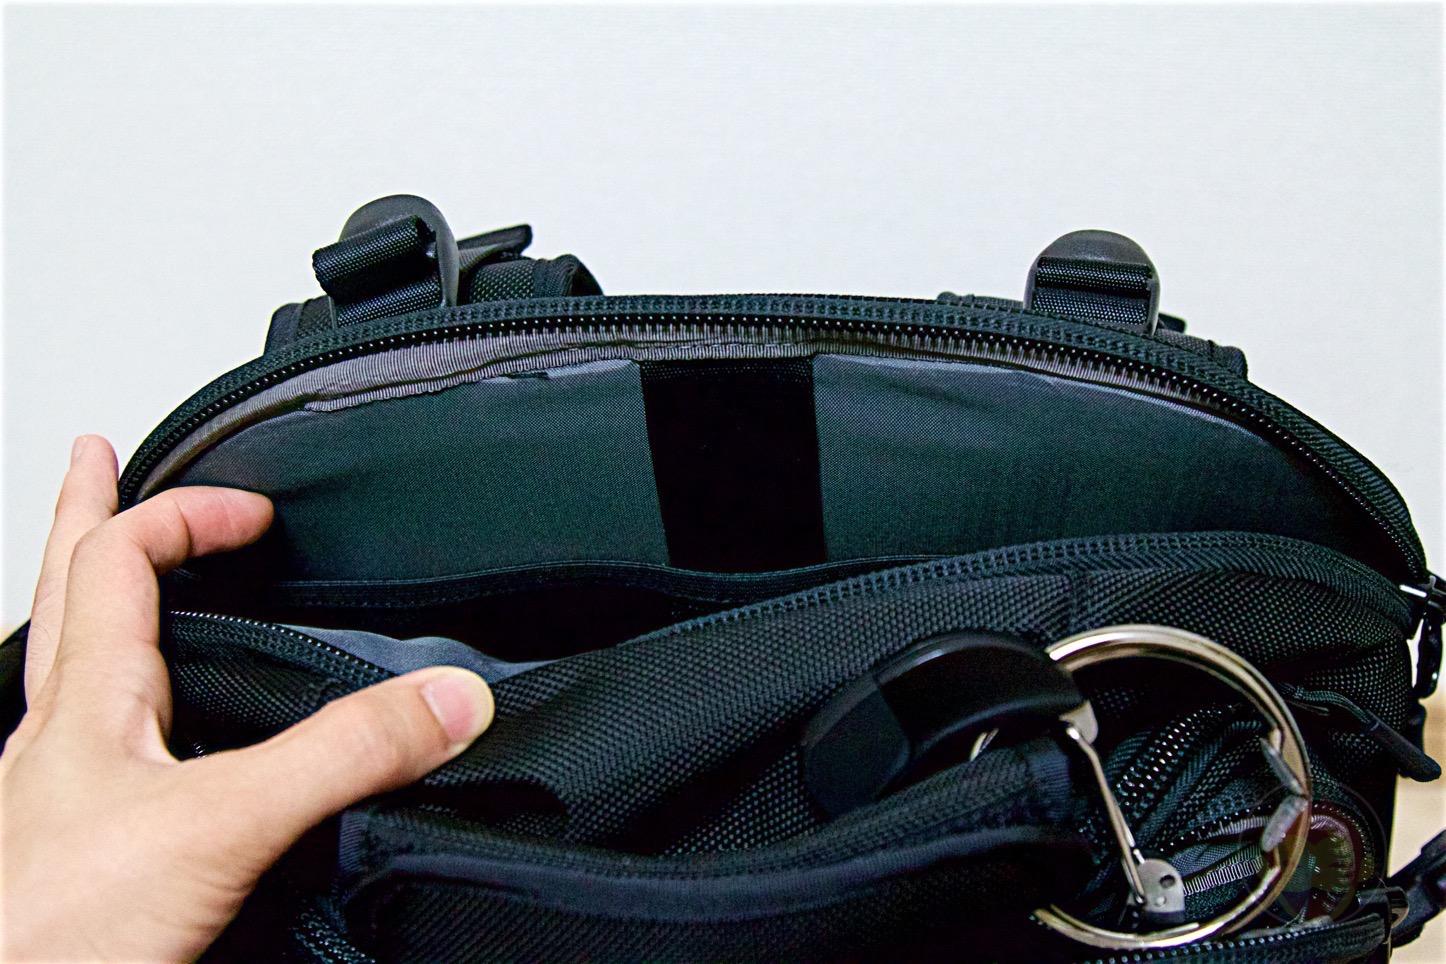 Aer-Travel-Pack-PC-Sleave-01.jpg